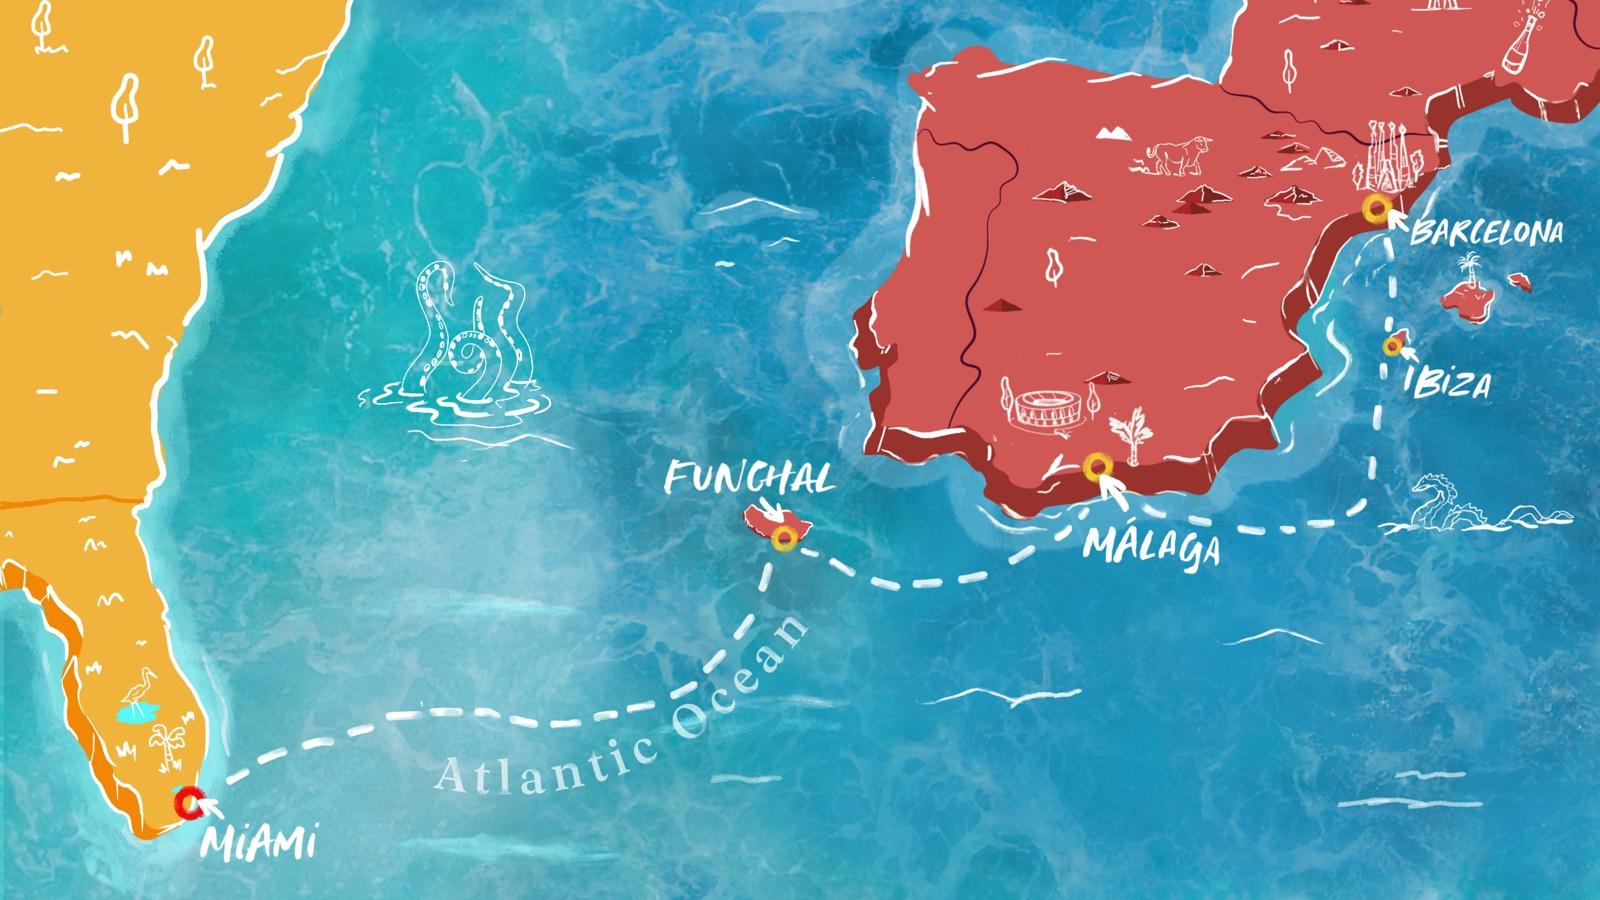 Valiant Lady Transatlantic Mediterranean to Miami Voyage